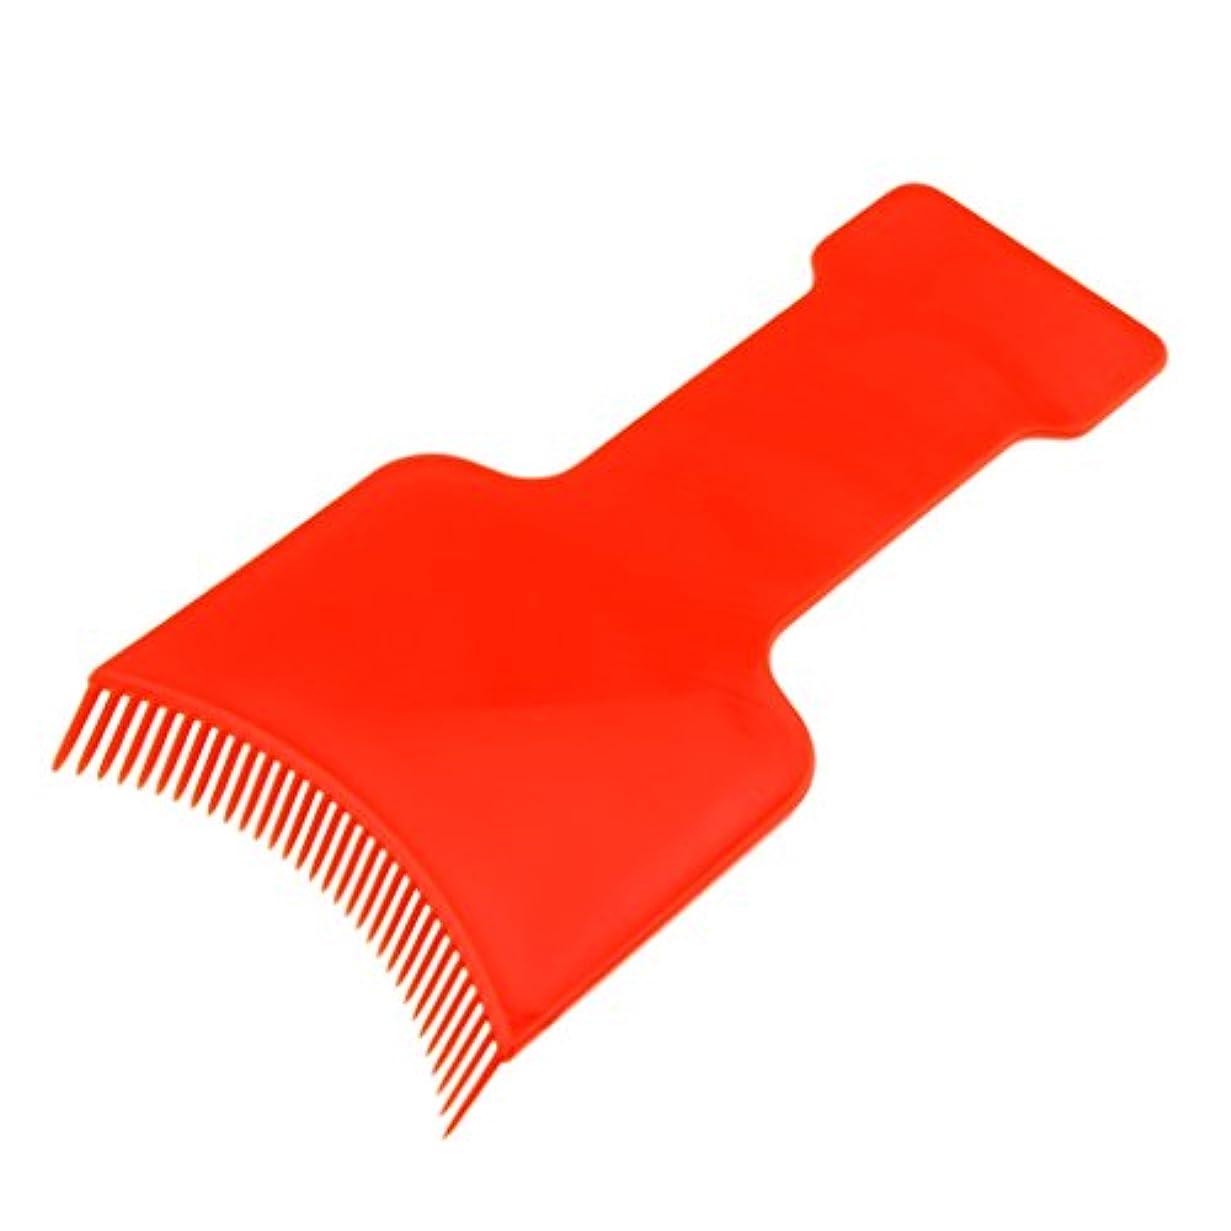 Homyl 染色プレート  染色櫛 ヘアカラーボード ヘアカラー ボード ヘアカラーティントプレート サロン 美容 自宅用 便利